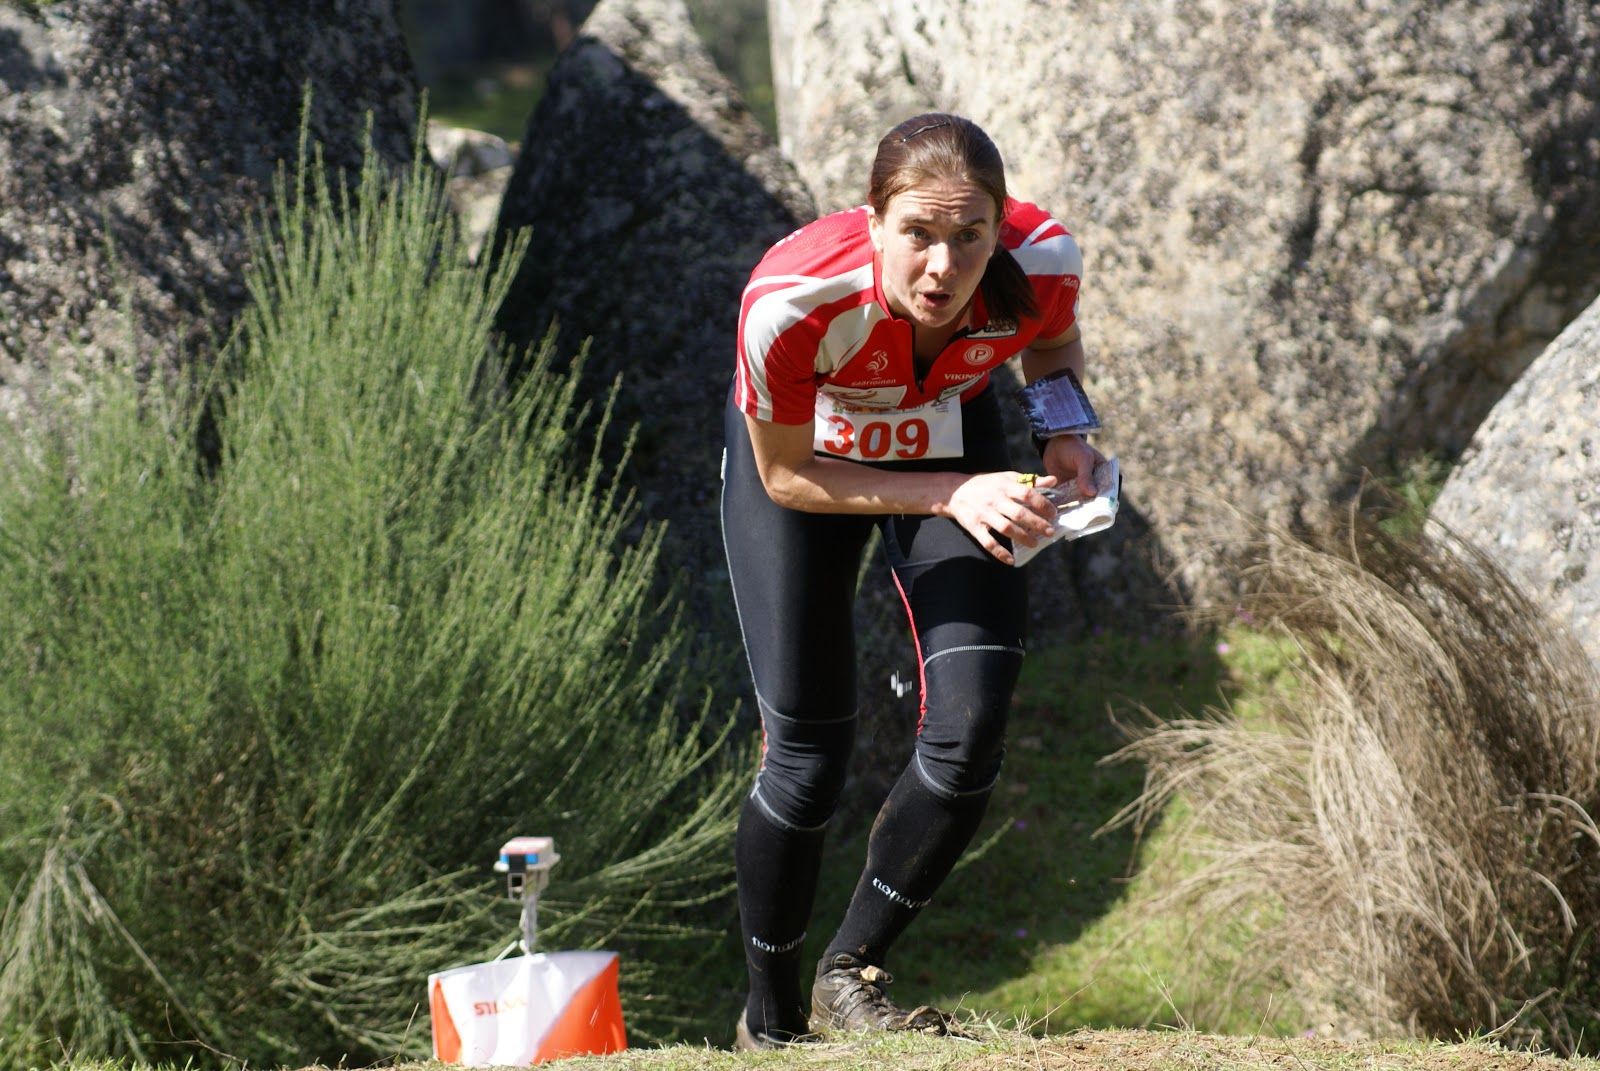 Portuguese Orienteering Blog: Riina Kuuselo: [New Zealand